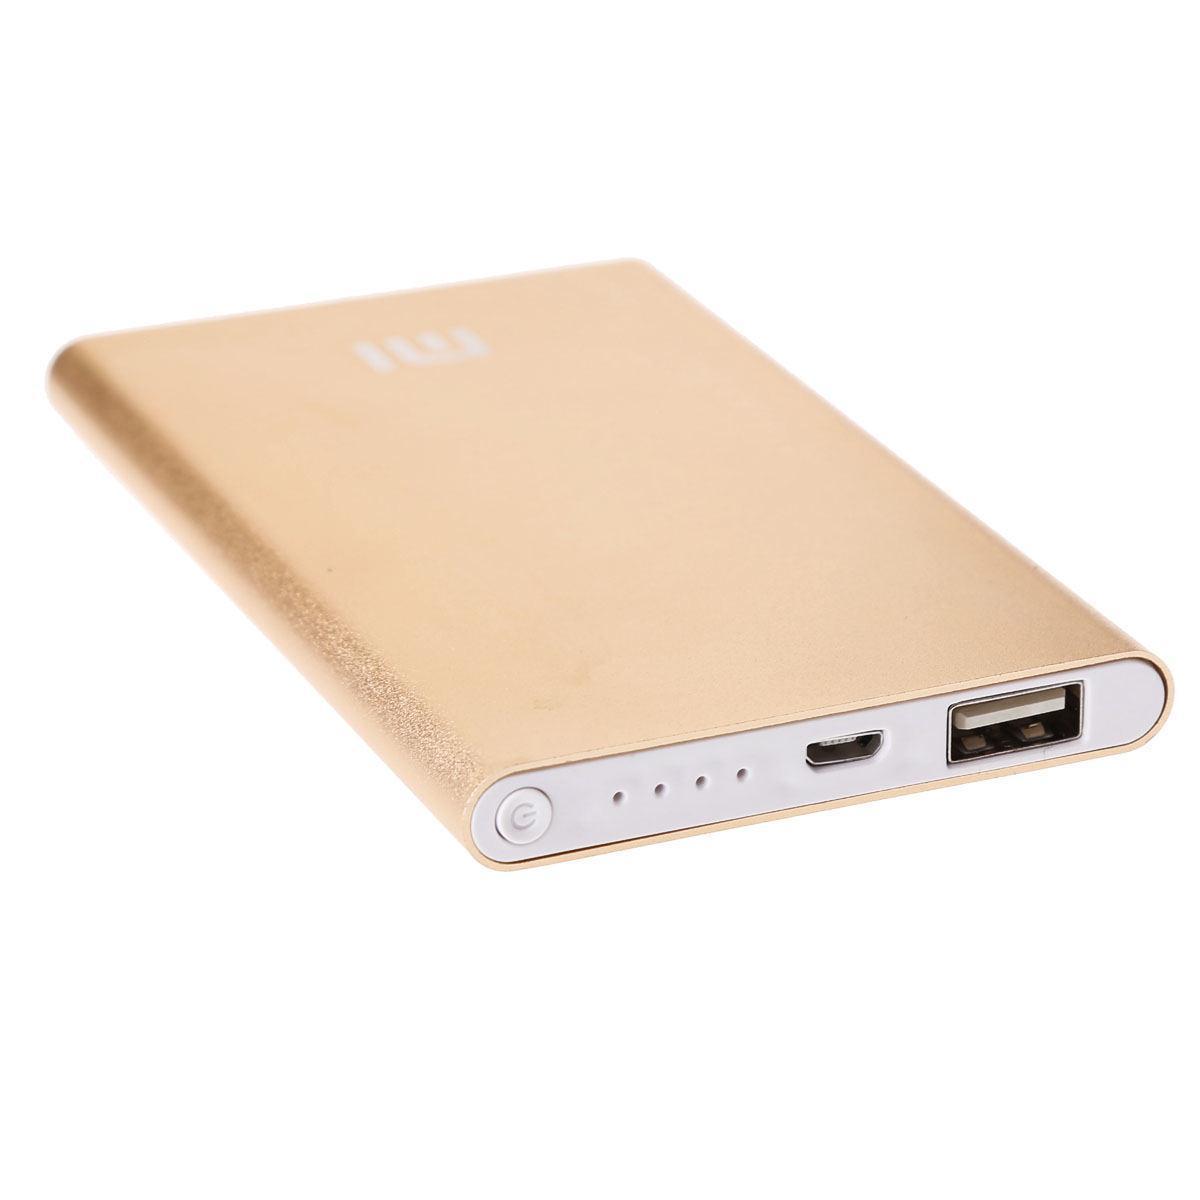 Внешний акумулятор Power bank Xiaomi 10000 mAh Gold